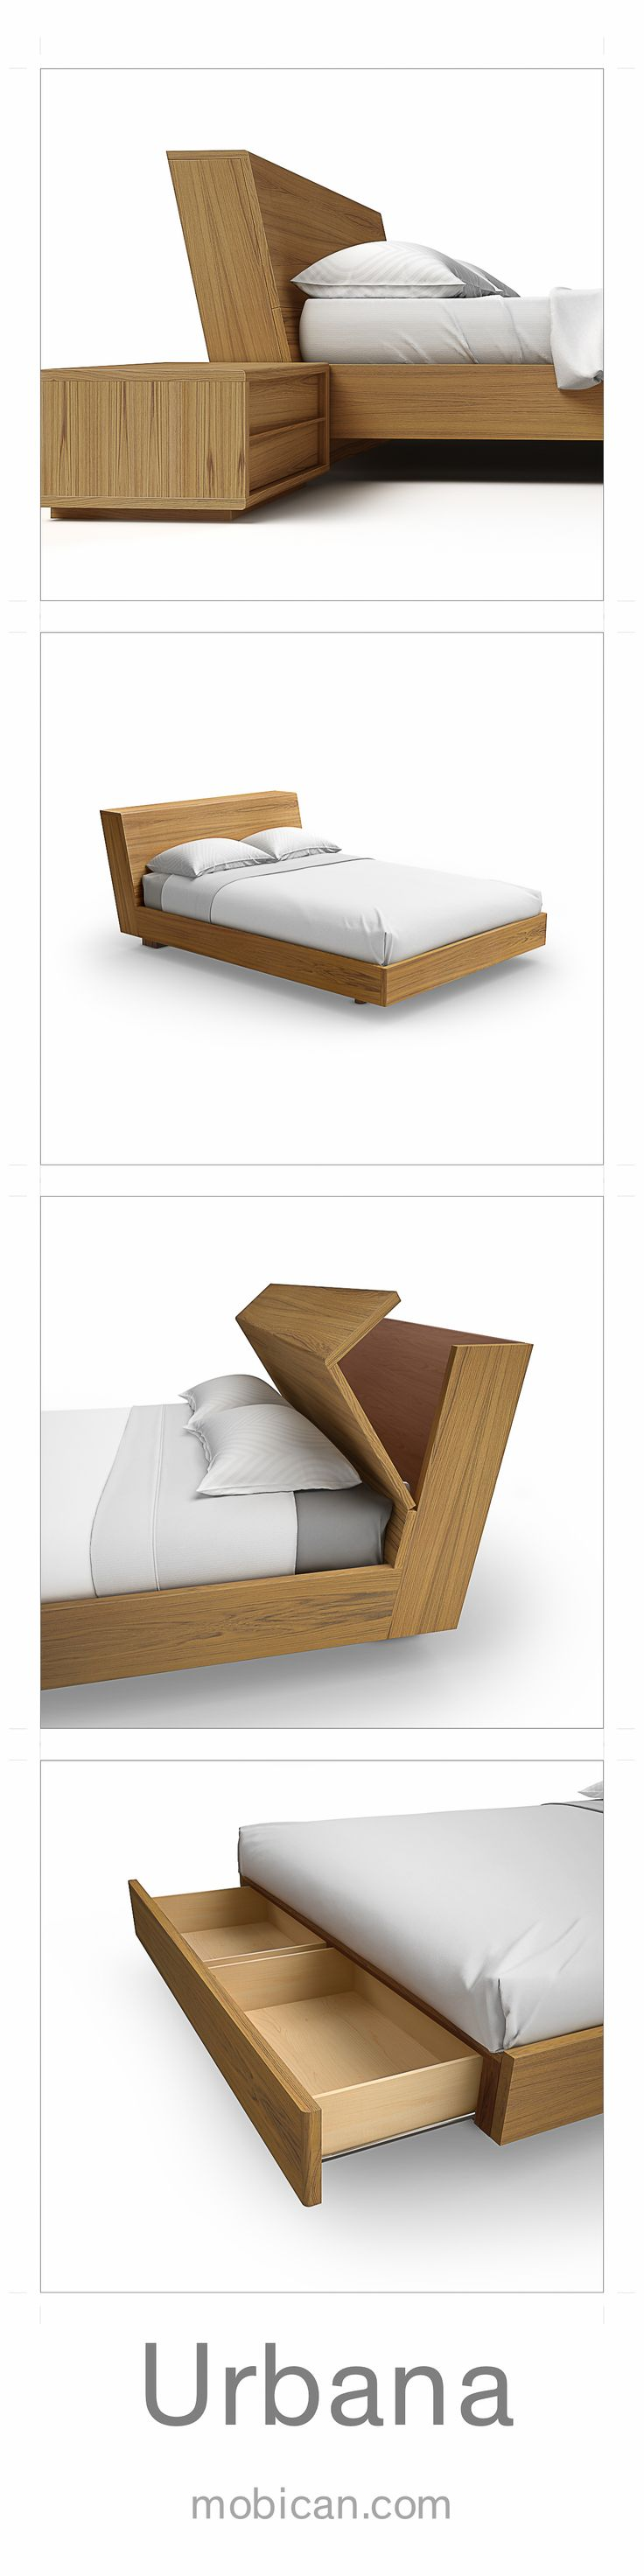 Click here to see the incredible details that are part of Mobican's Urbana bed / Cliquez ici pour voir les détails du lit Urbana de Mobican: http://mobican.com/en/urbana-chambre-a-coucher/ #mobican #bedroom #bed #storage #madeincanada #contemporary